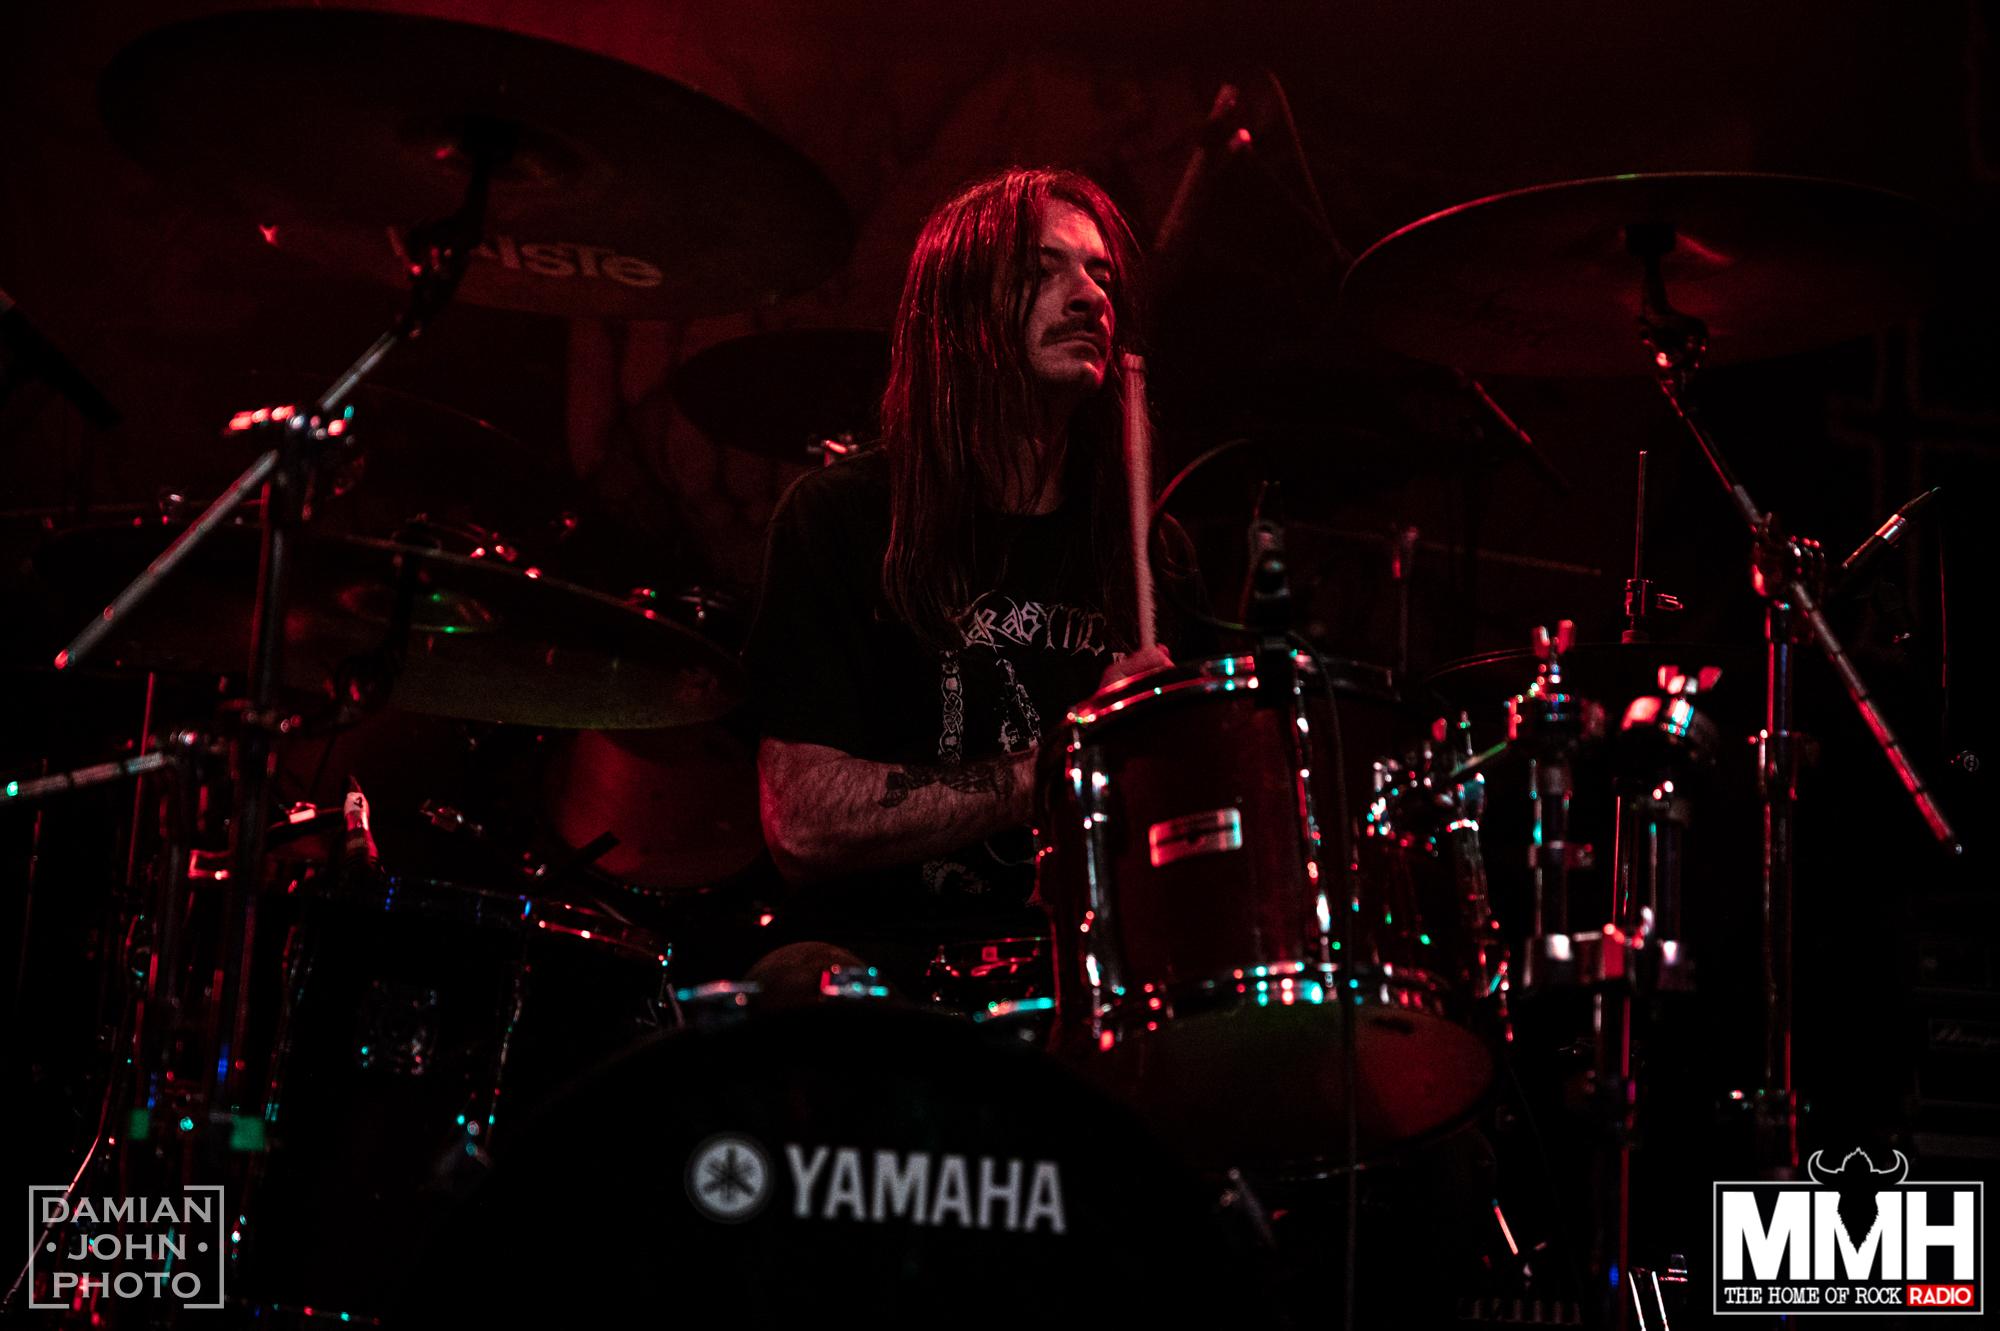 american heavy metal band bat performing at the O2 Institute birmingham